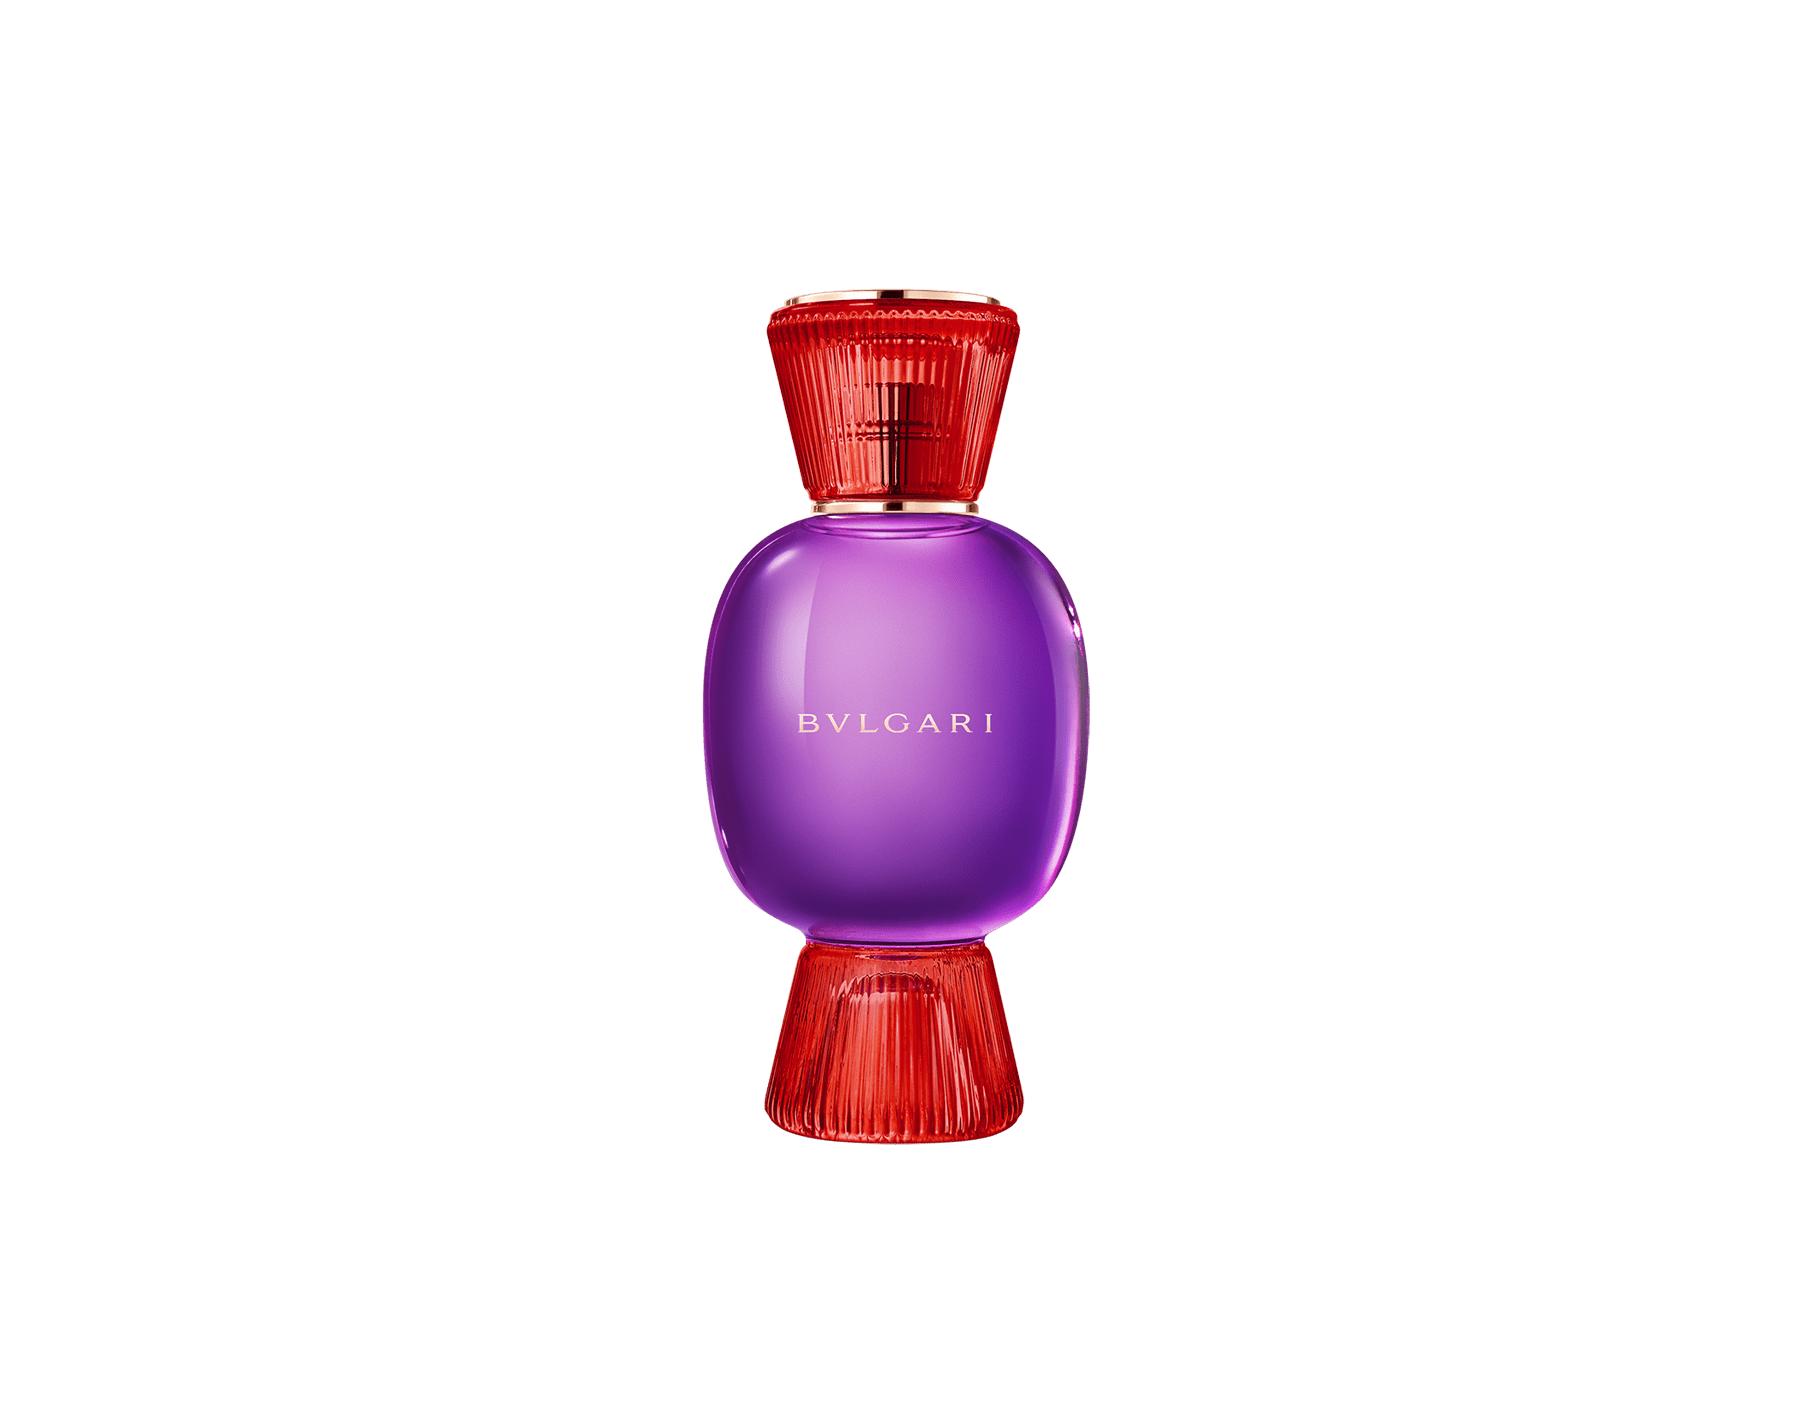 獨特香水套組,和您一樣大膽特別。歡欣喜悅的柑苔調 Fantasia Veneta Allegra 淡香精融合感性耀眼的 Magnifying Patchouli 廣藿香精華,創造出個性鮮明的女香。 Perfume-Set-Fantasia-Veneta-Eau-de-Parfum-and-Patchouli-Magnifying image 2